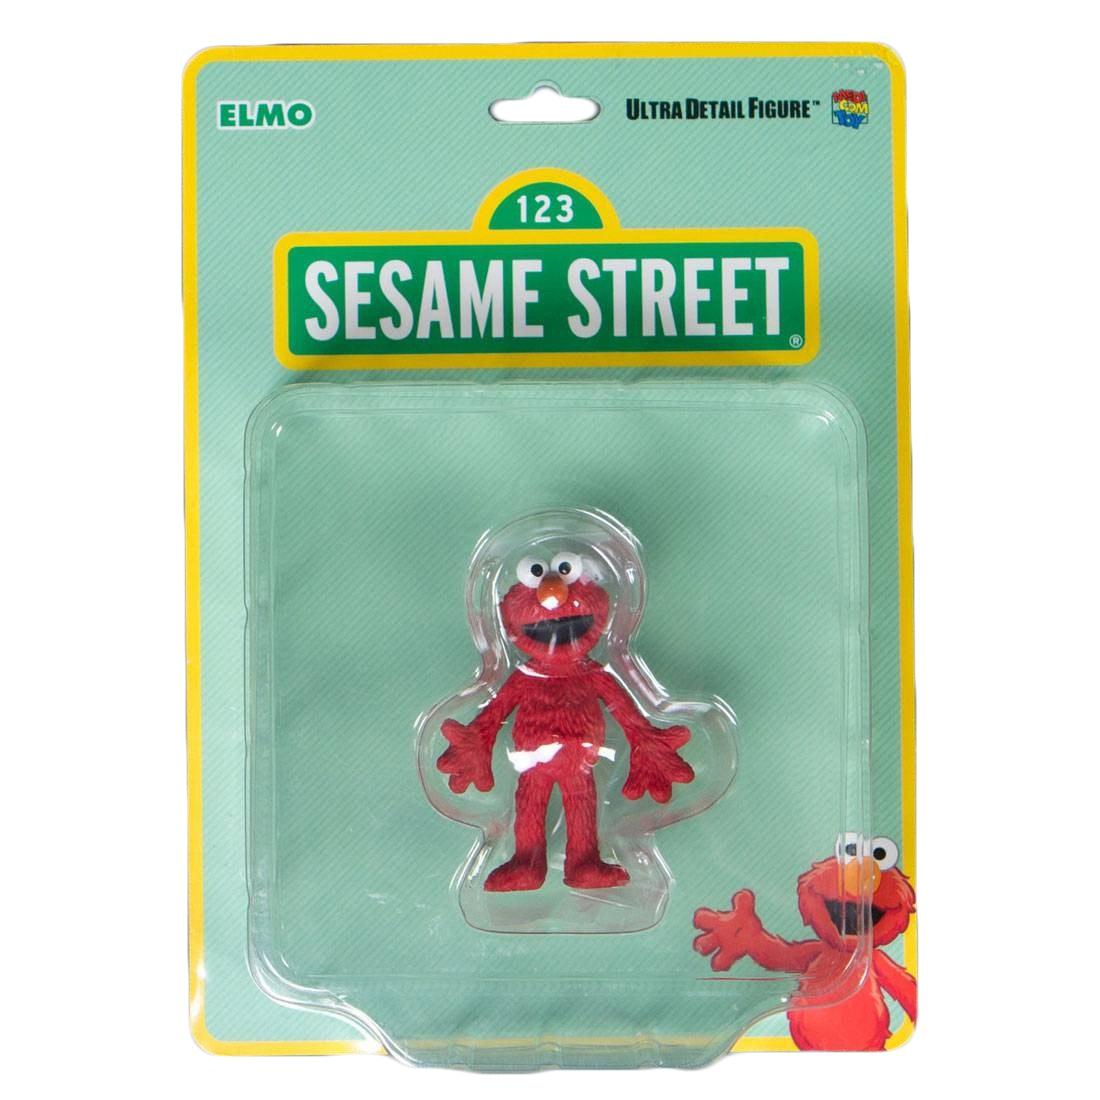 Medicom UDF-328 Ultra Detail Figure Sesame Street Oscar the Grouch